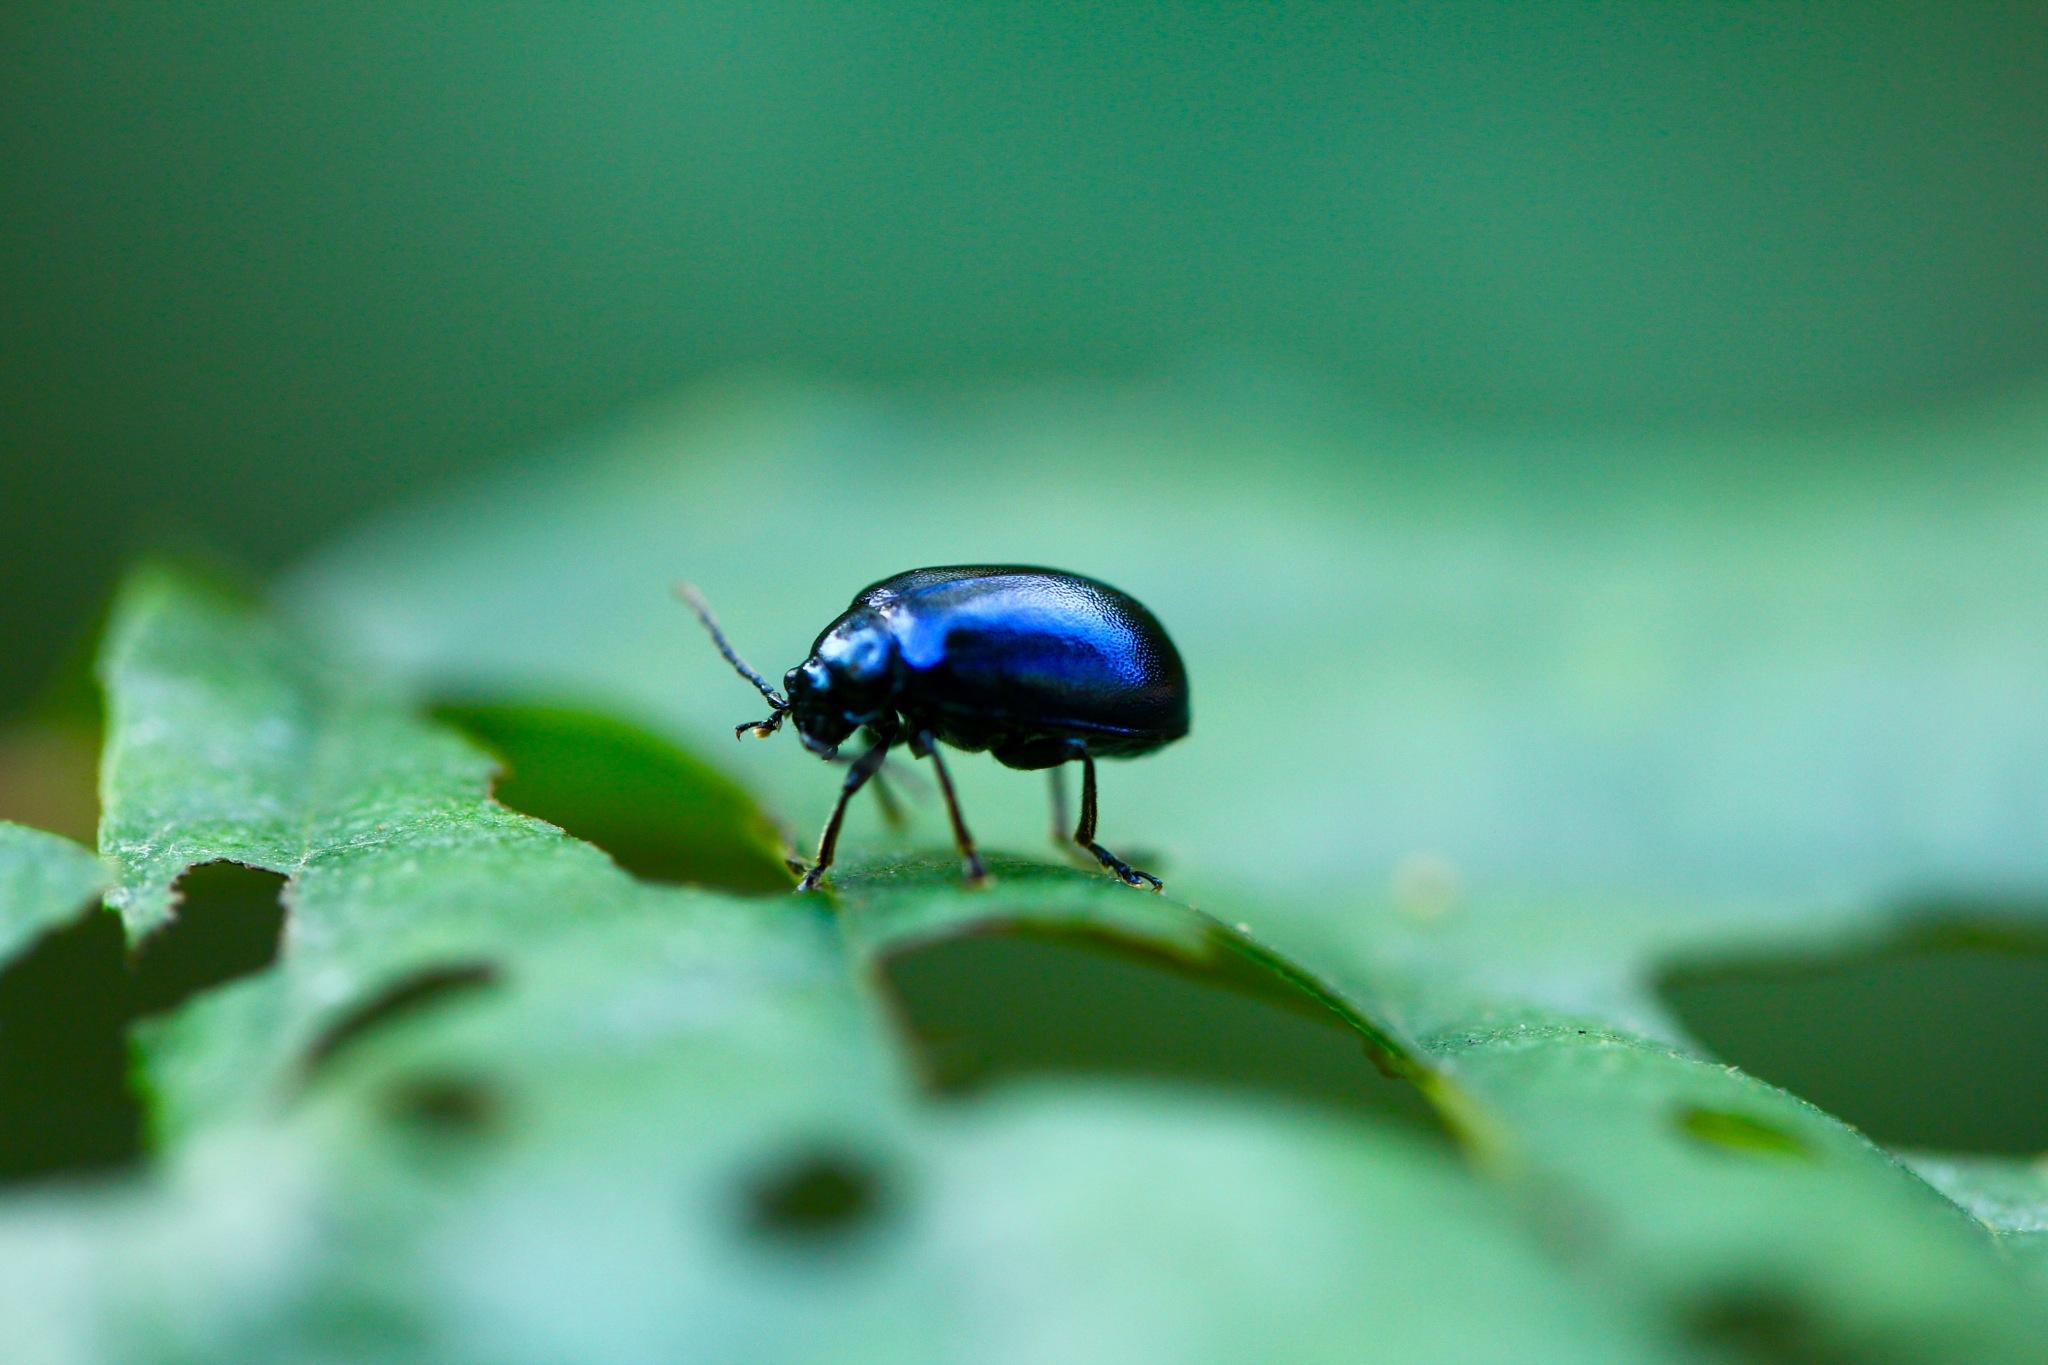 Beetle by SofiesFoto